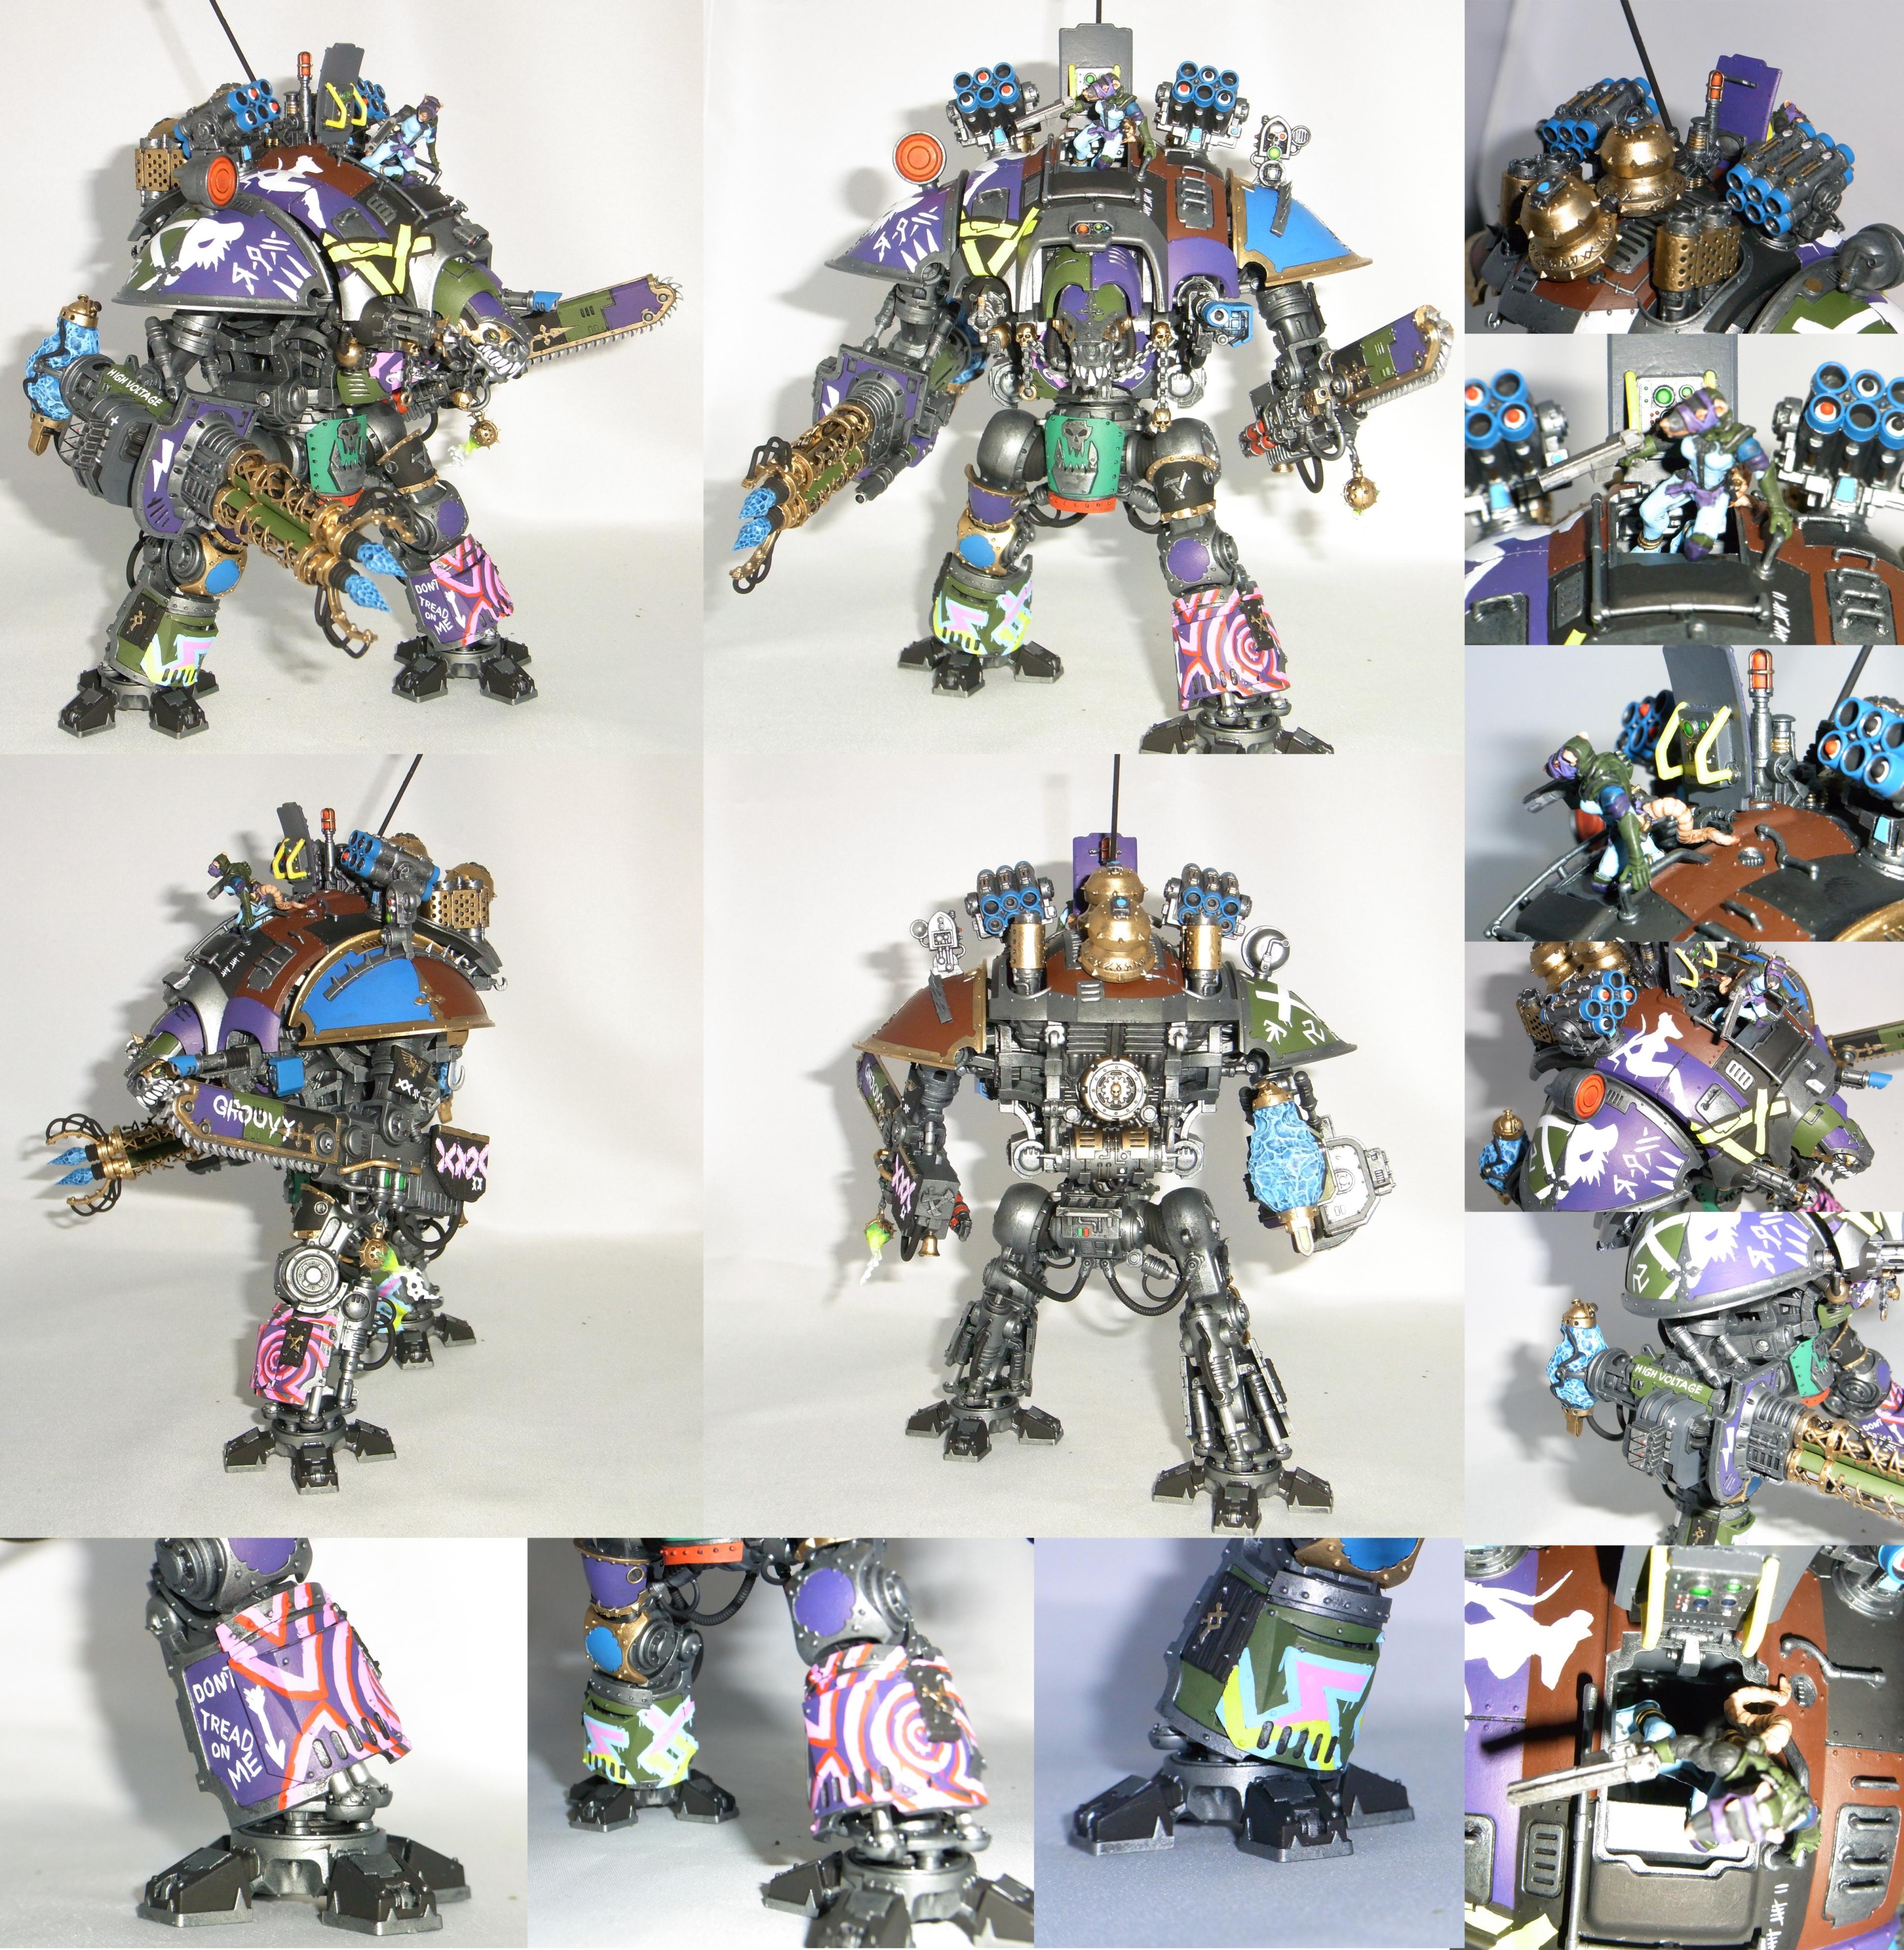 Cannon, Chainfist, Dont, Female, Flamer, Graffitti, Imperial, Knights, Korbenn, Lascannon, Lightning, Me, Necrons, On, Pilot, Rat, Tesla, Titan, Treat